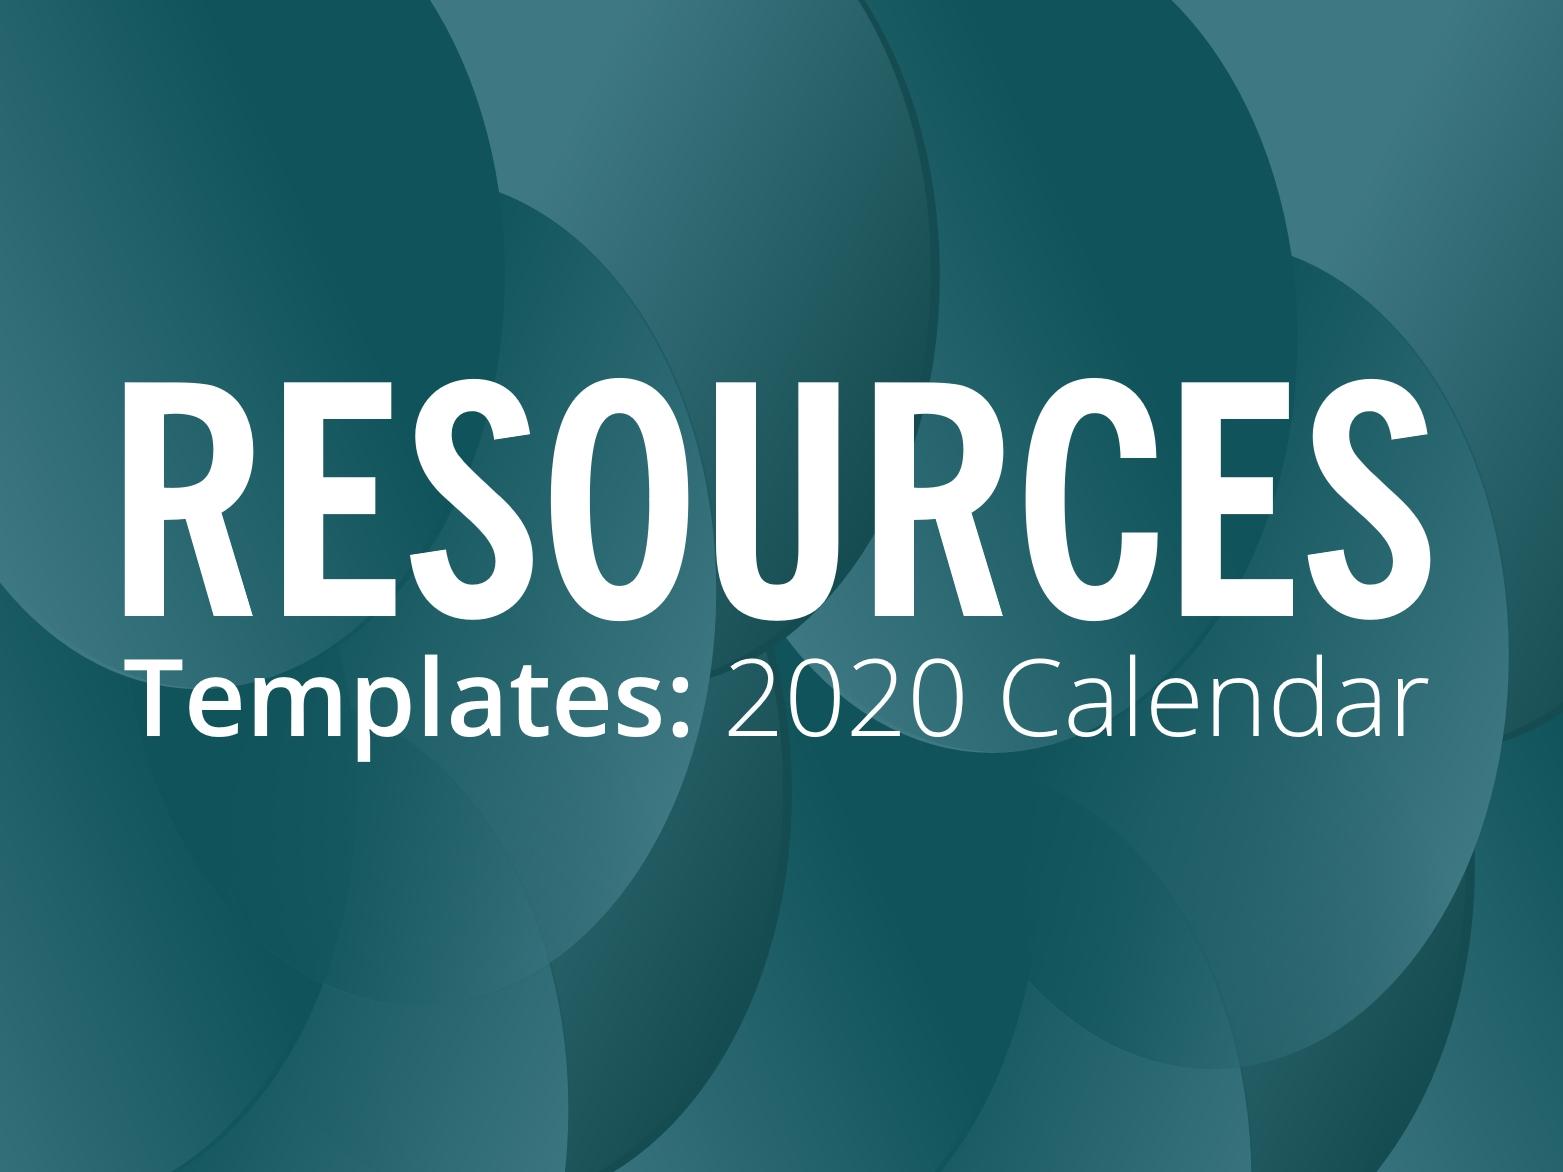 RESOURCES: 2020 calendar template